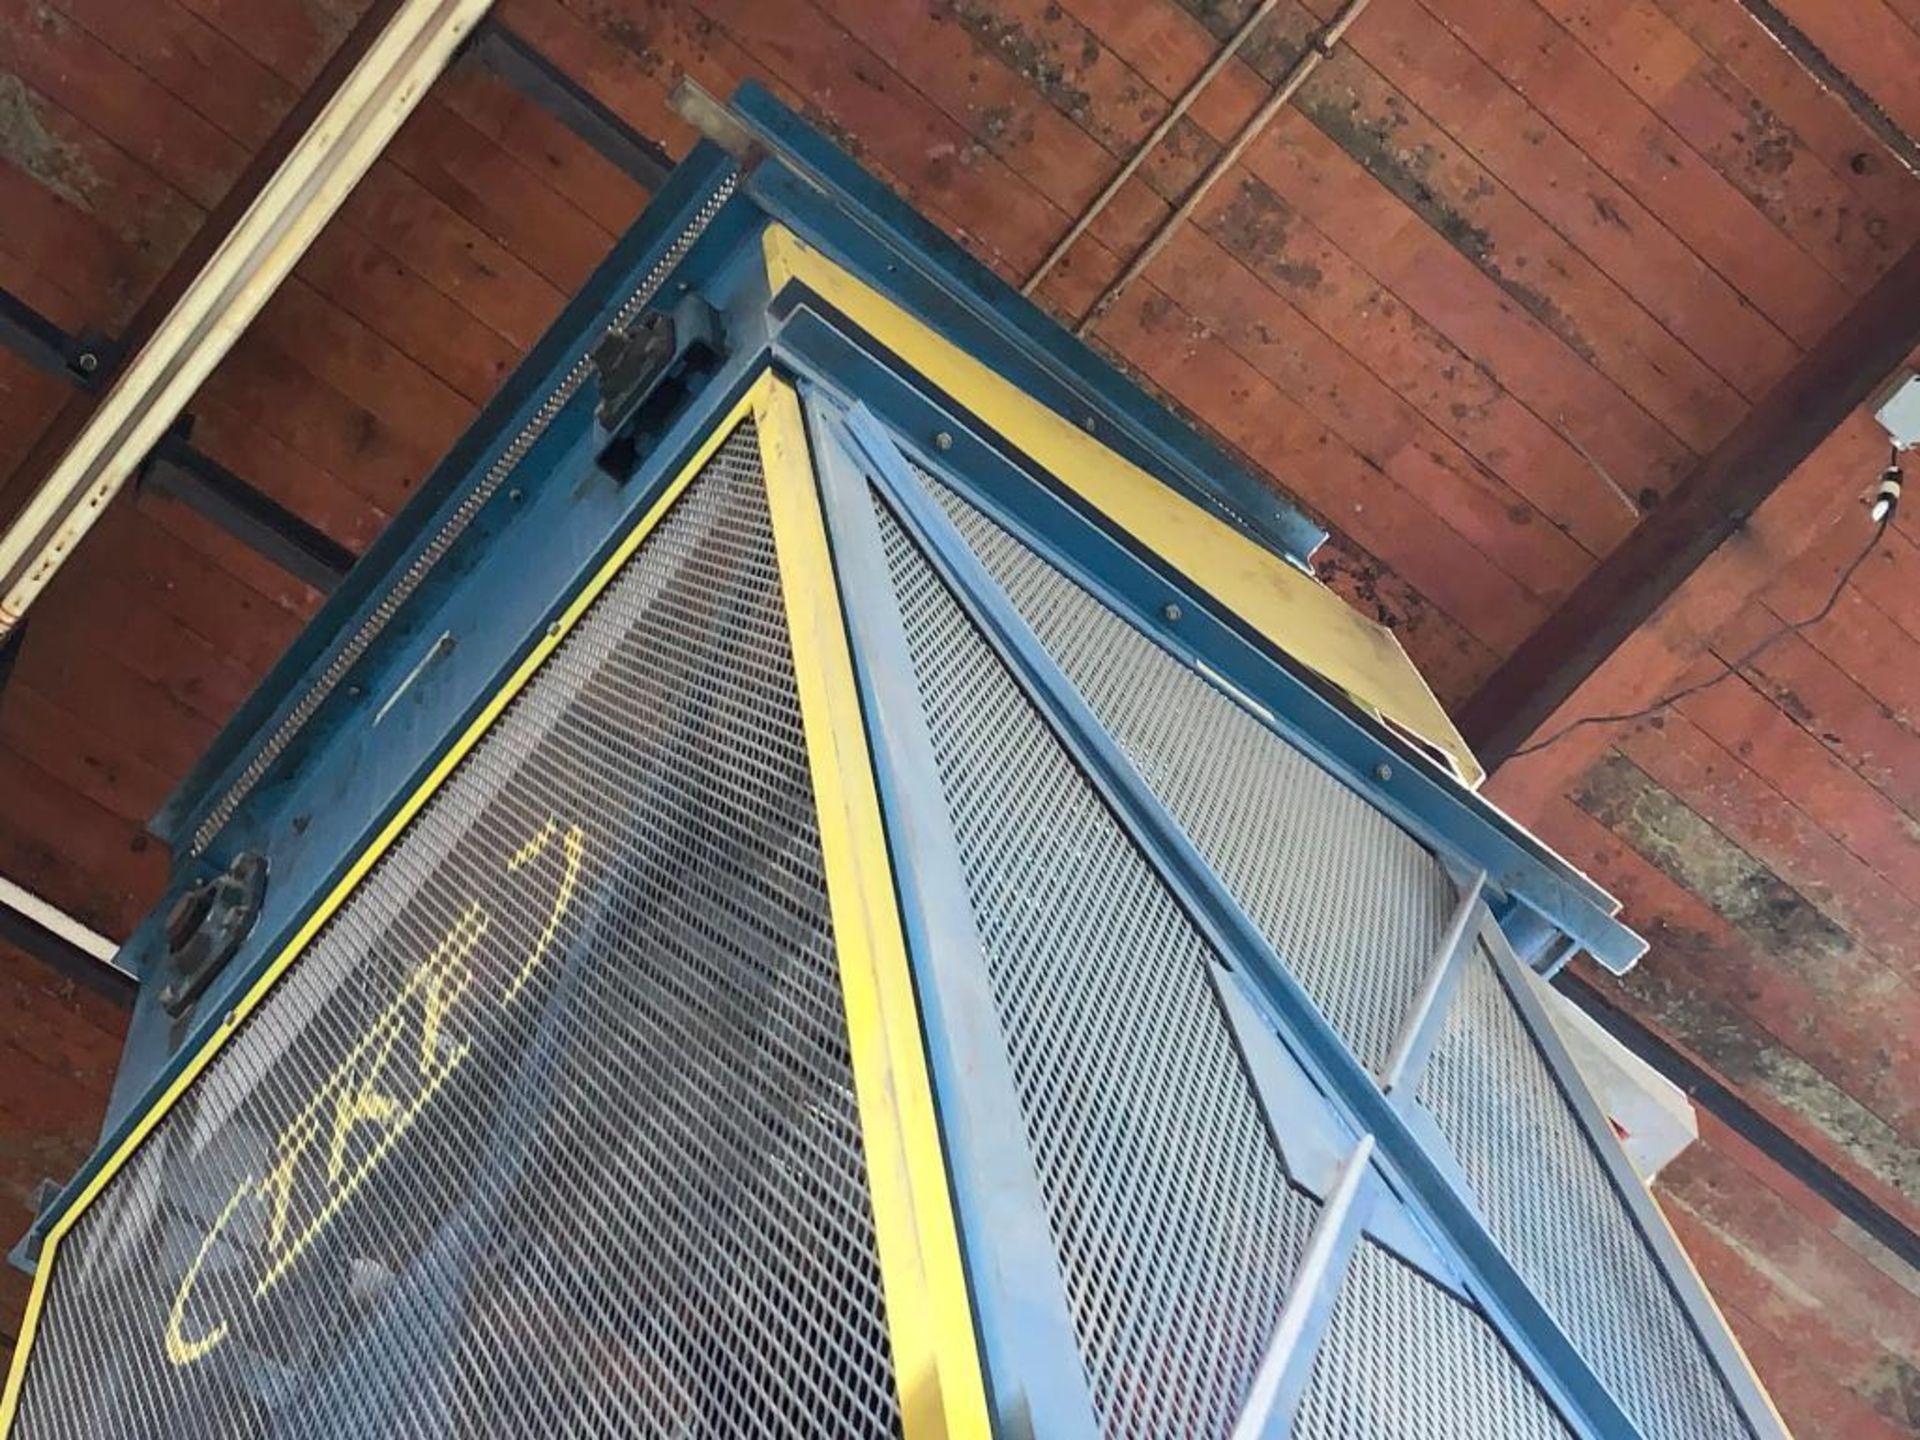 TKF vertical case elevator parts - Image 11 of 13